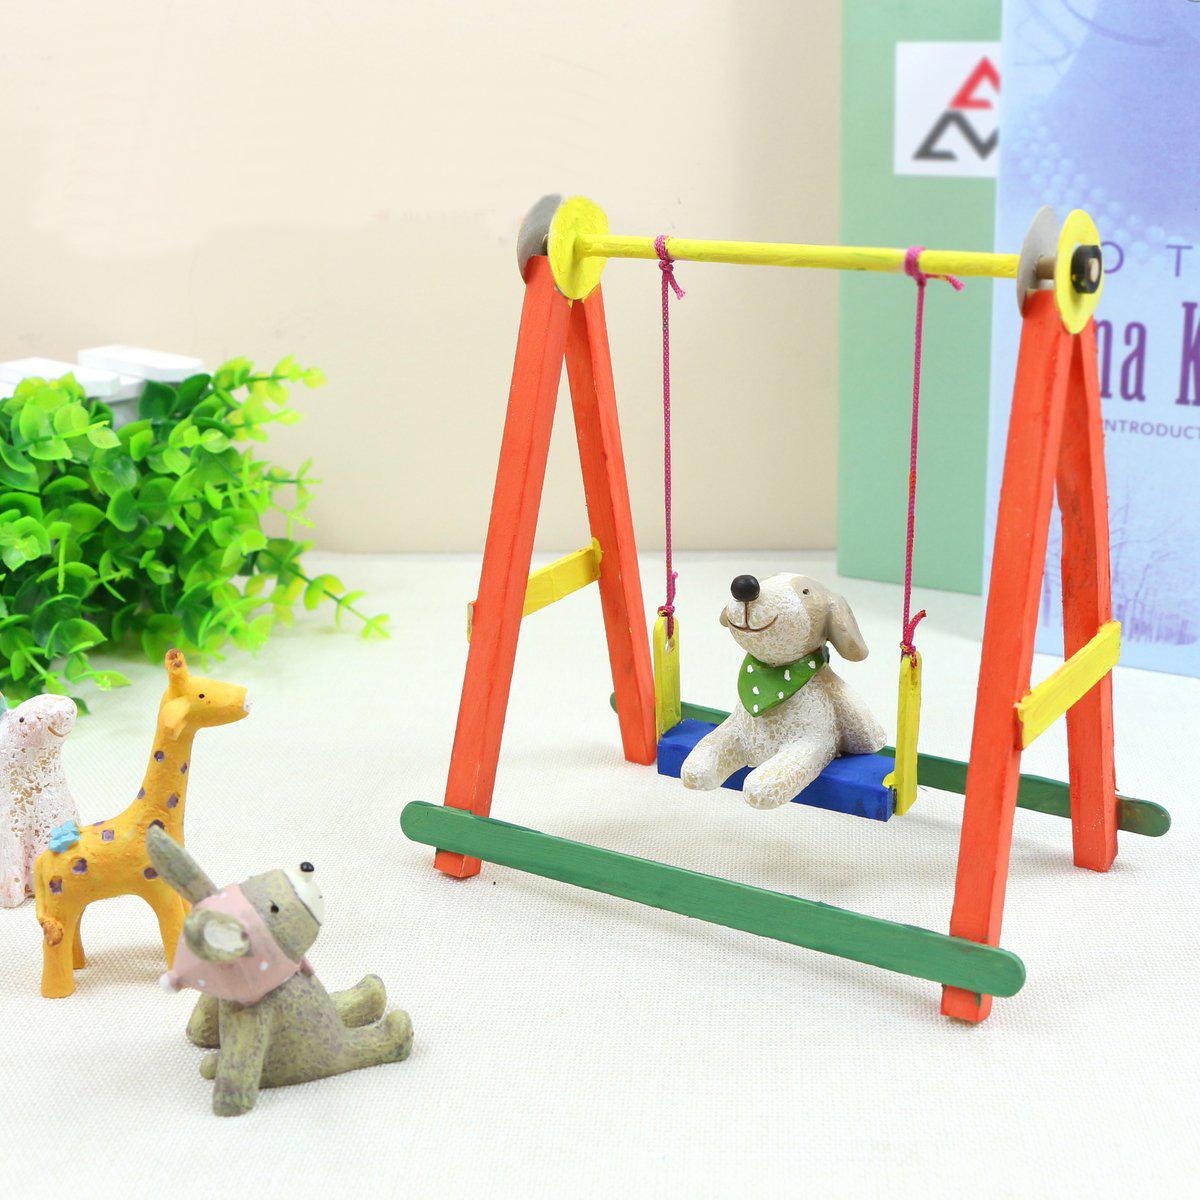 Научные игрушки Артикул 556169404589